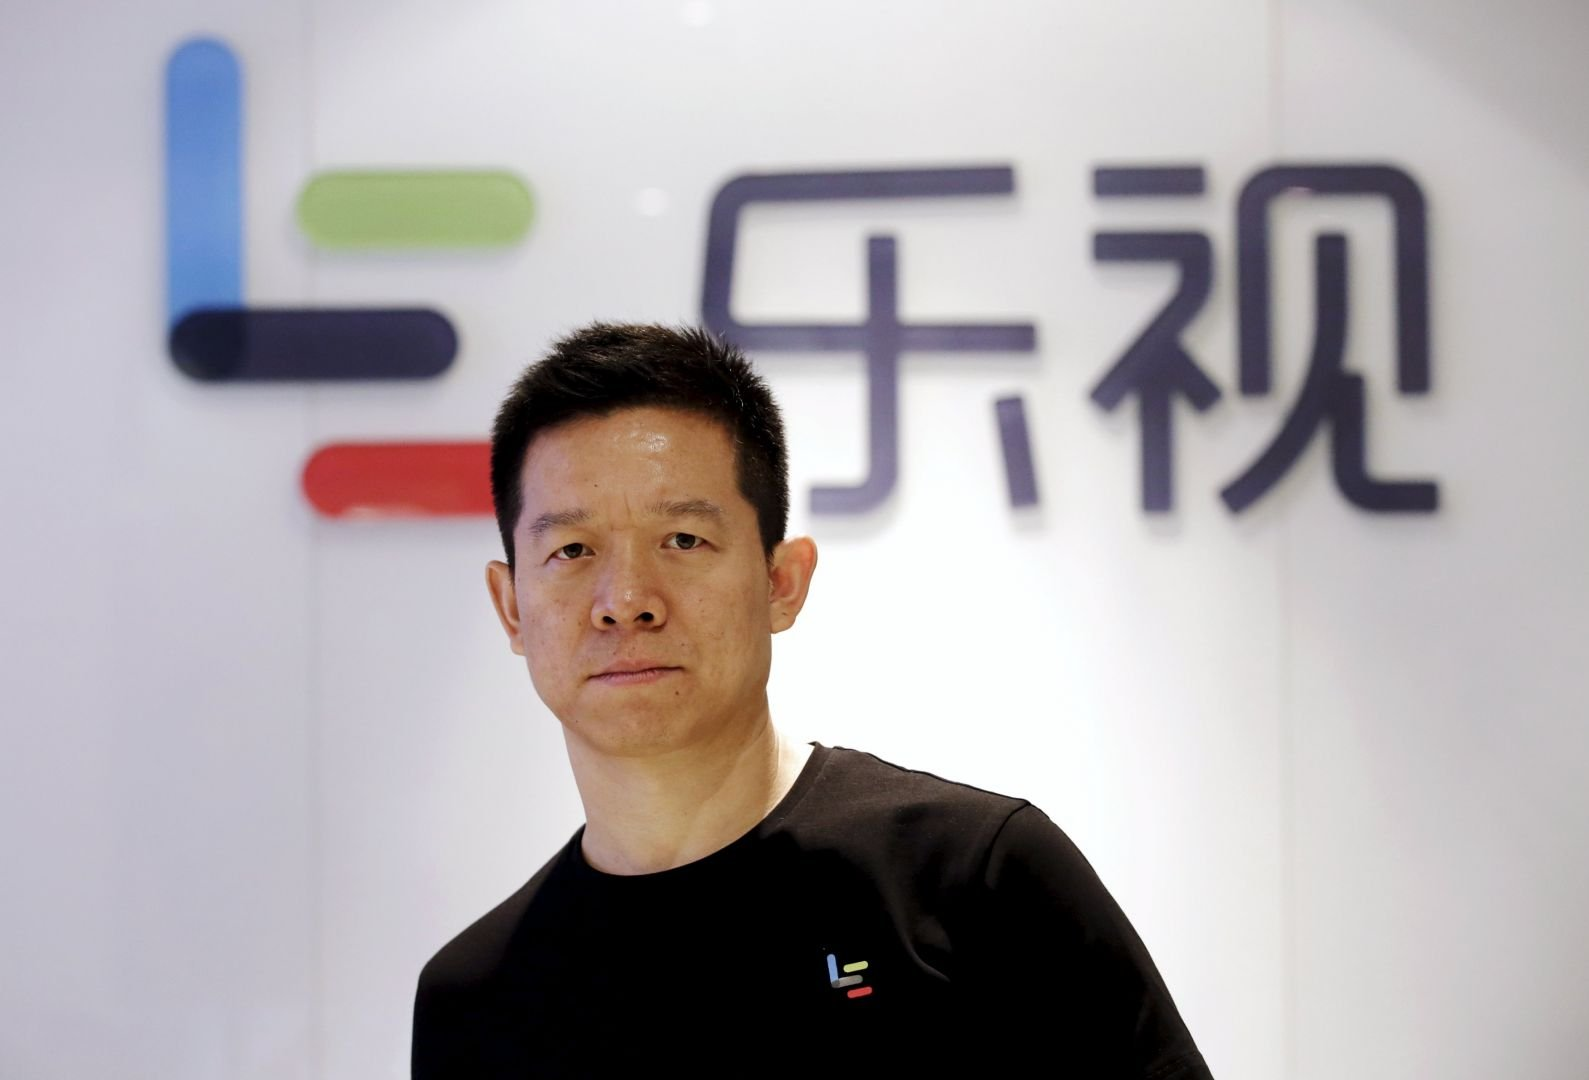 LeEco Jia Yueting